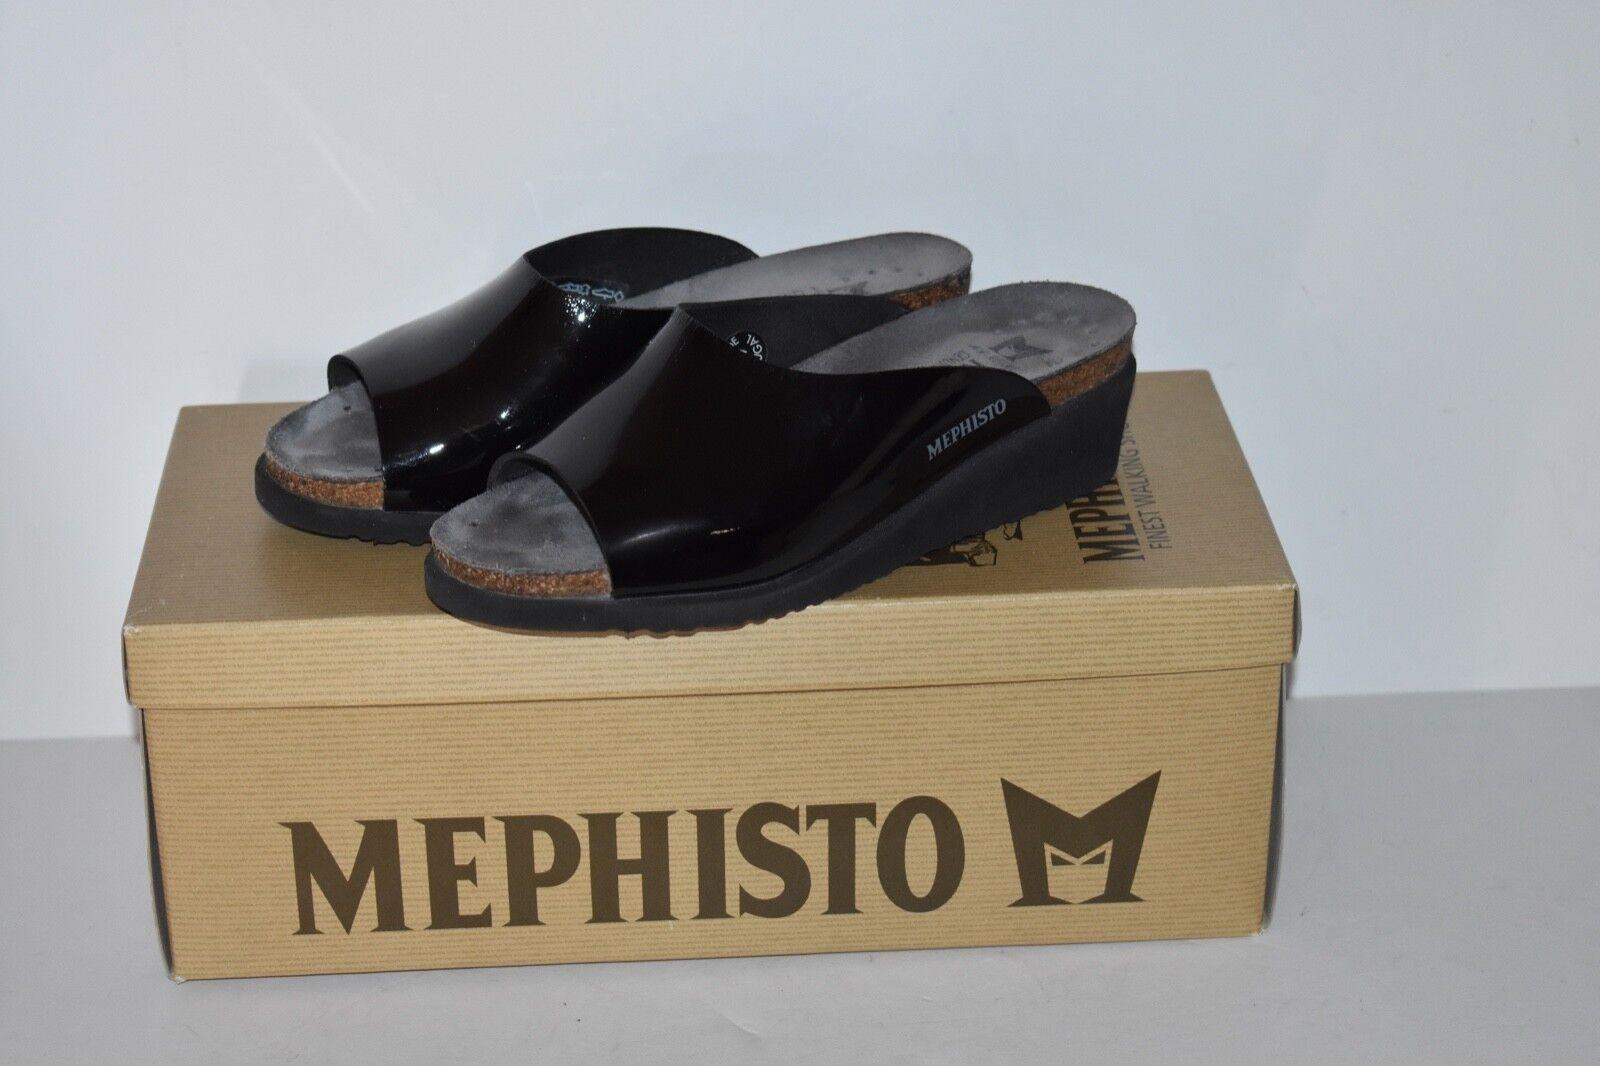 Mephisto Essy Black Patent Sandalbuck Biofit Biofit Biofit Nubuck Size US 5 d58c7a